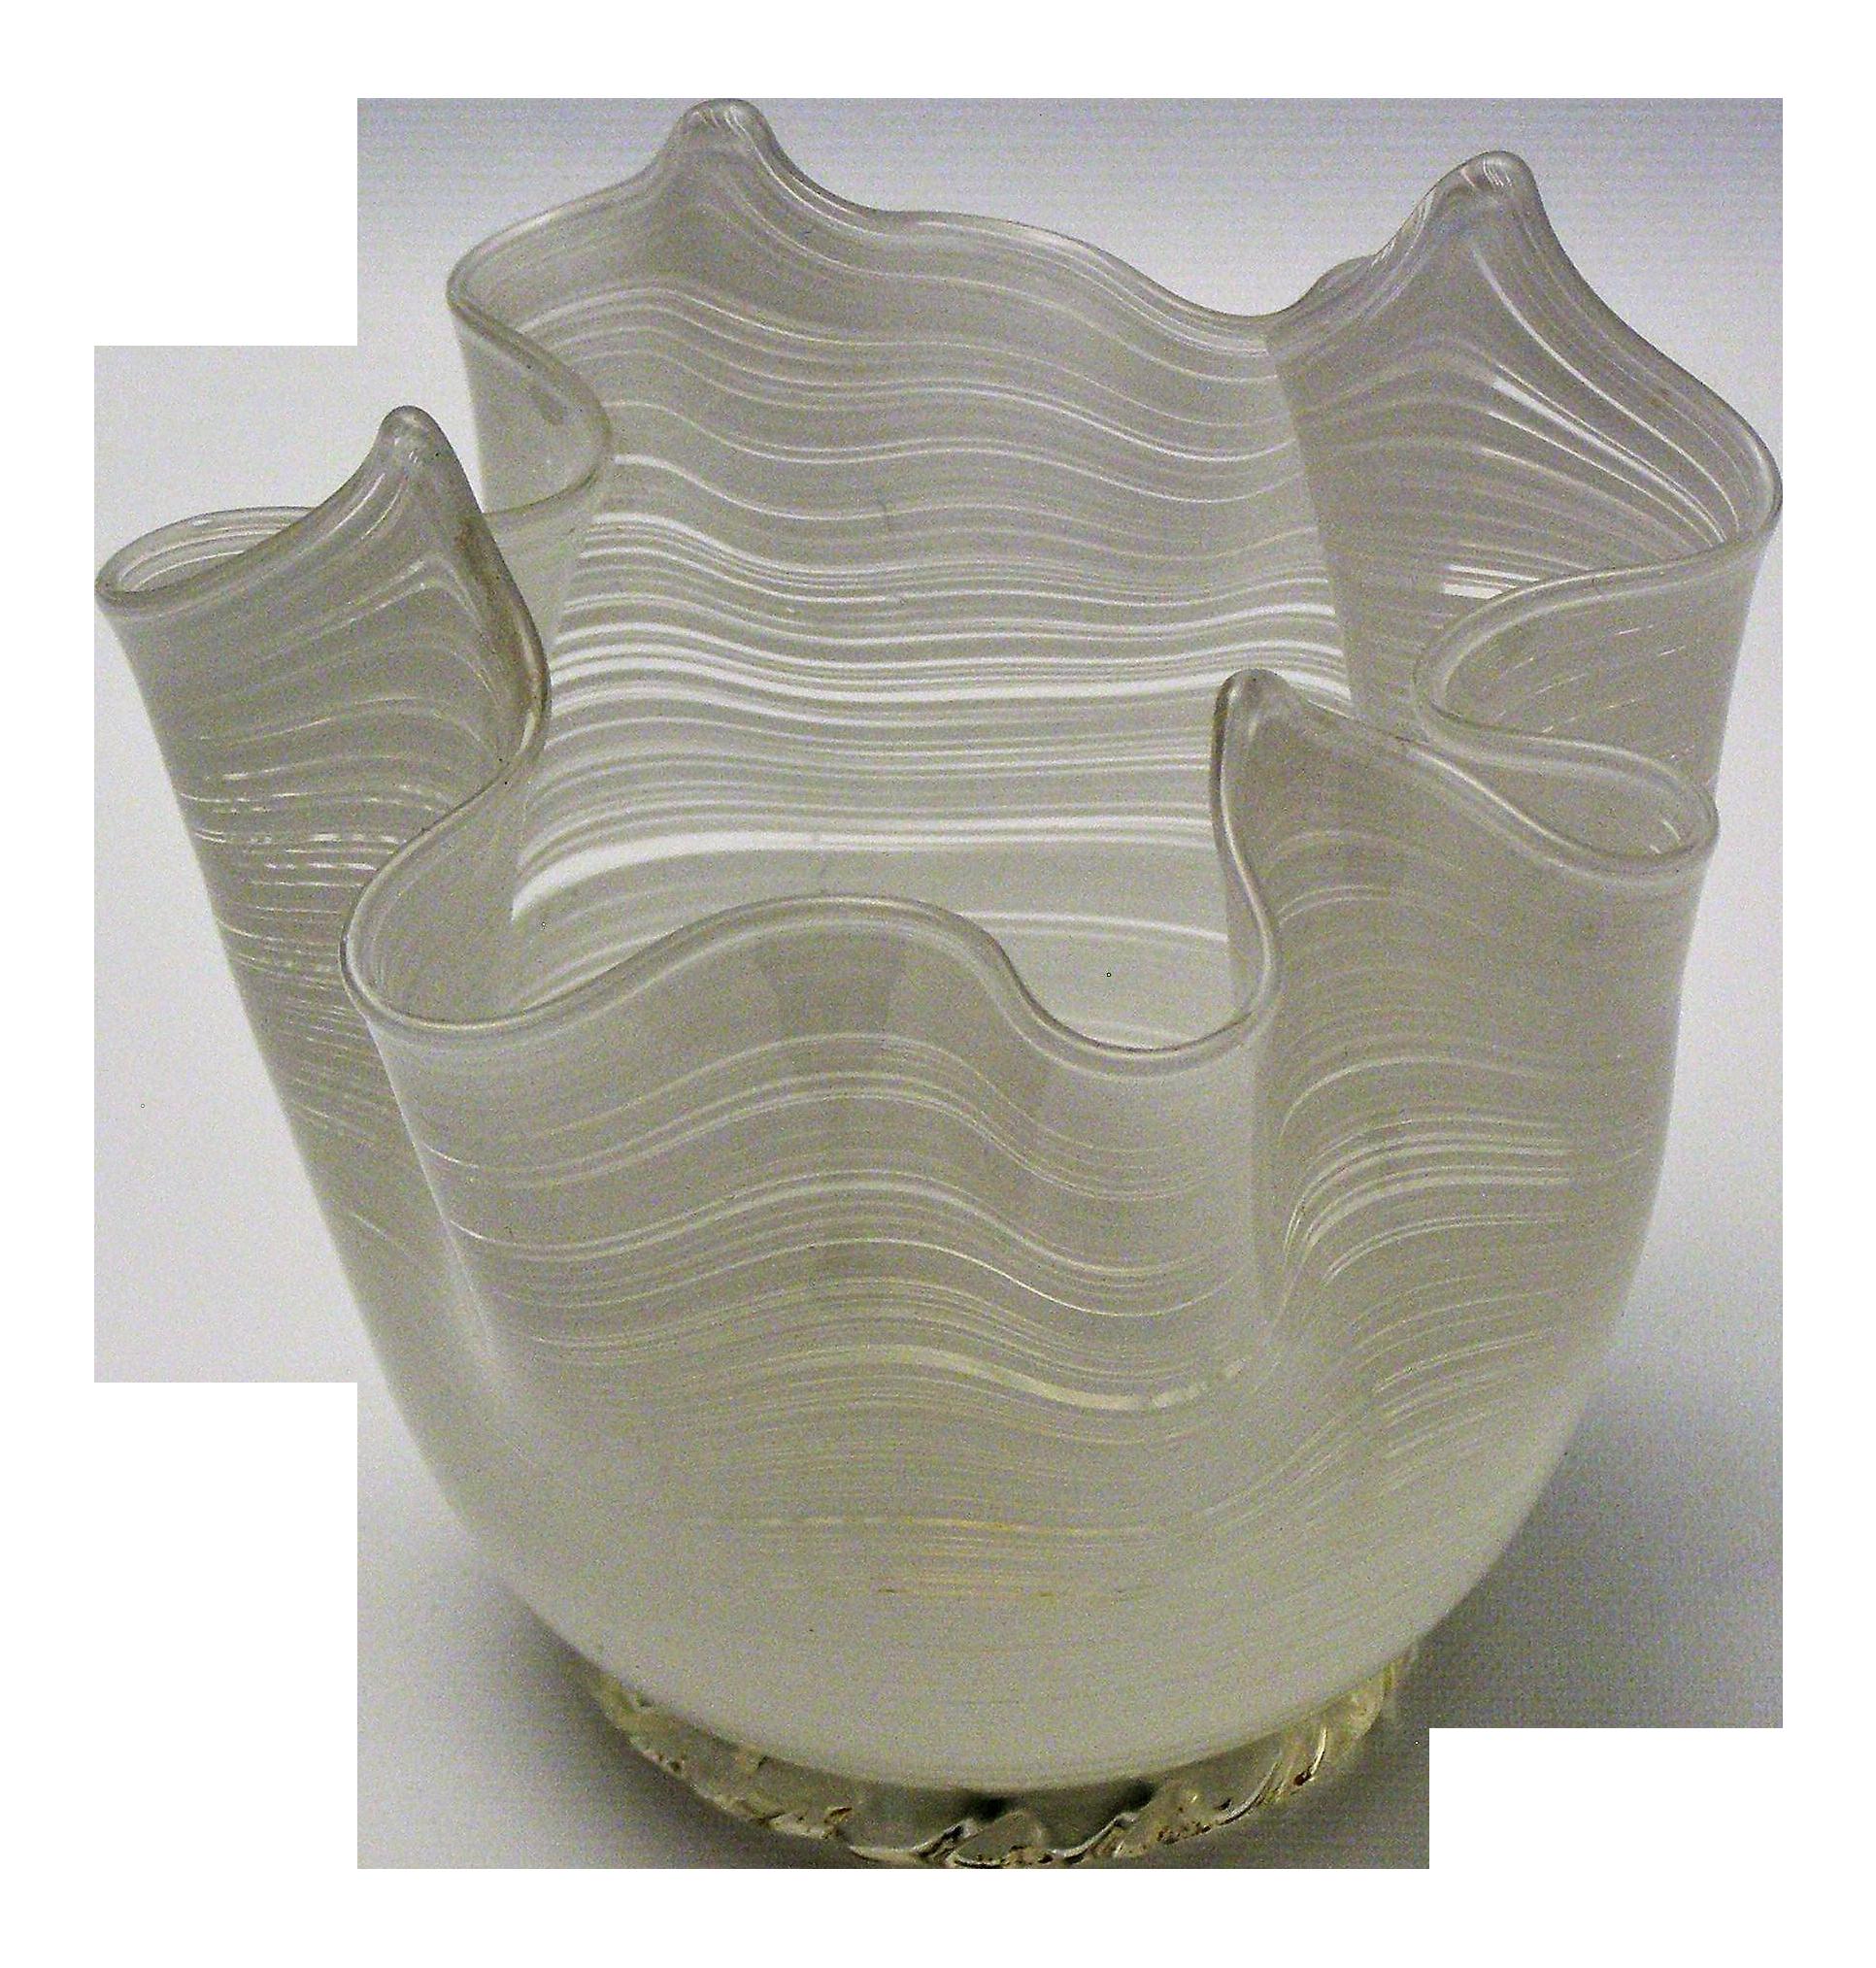 Vintage Aureliano Toso Murano Venetian Handkerchief Glass